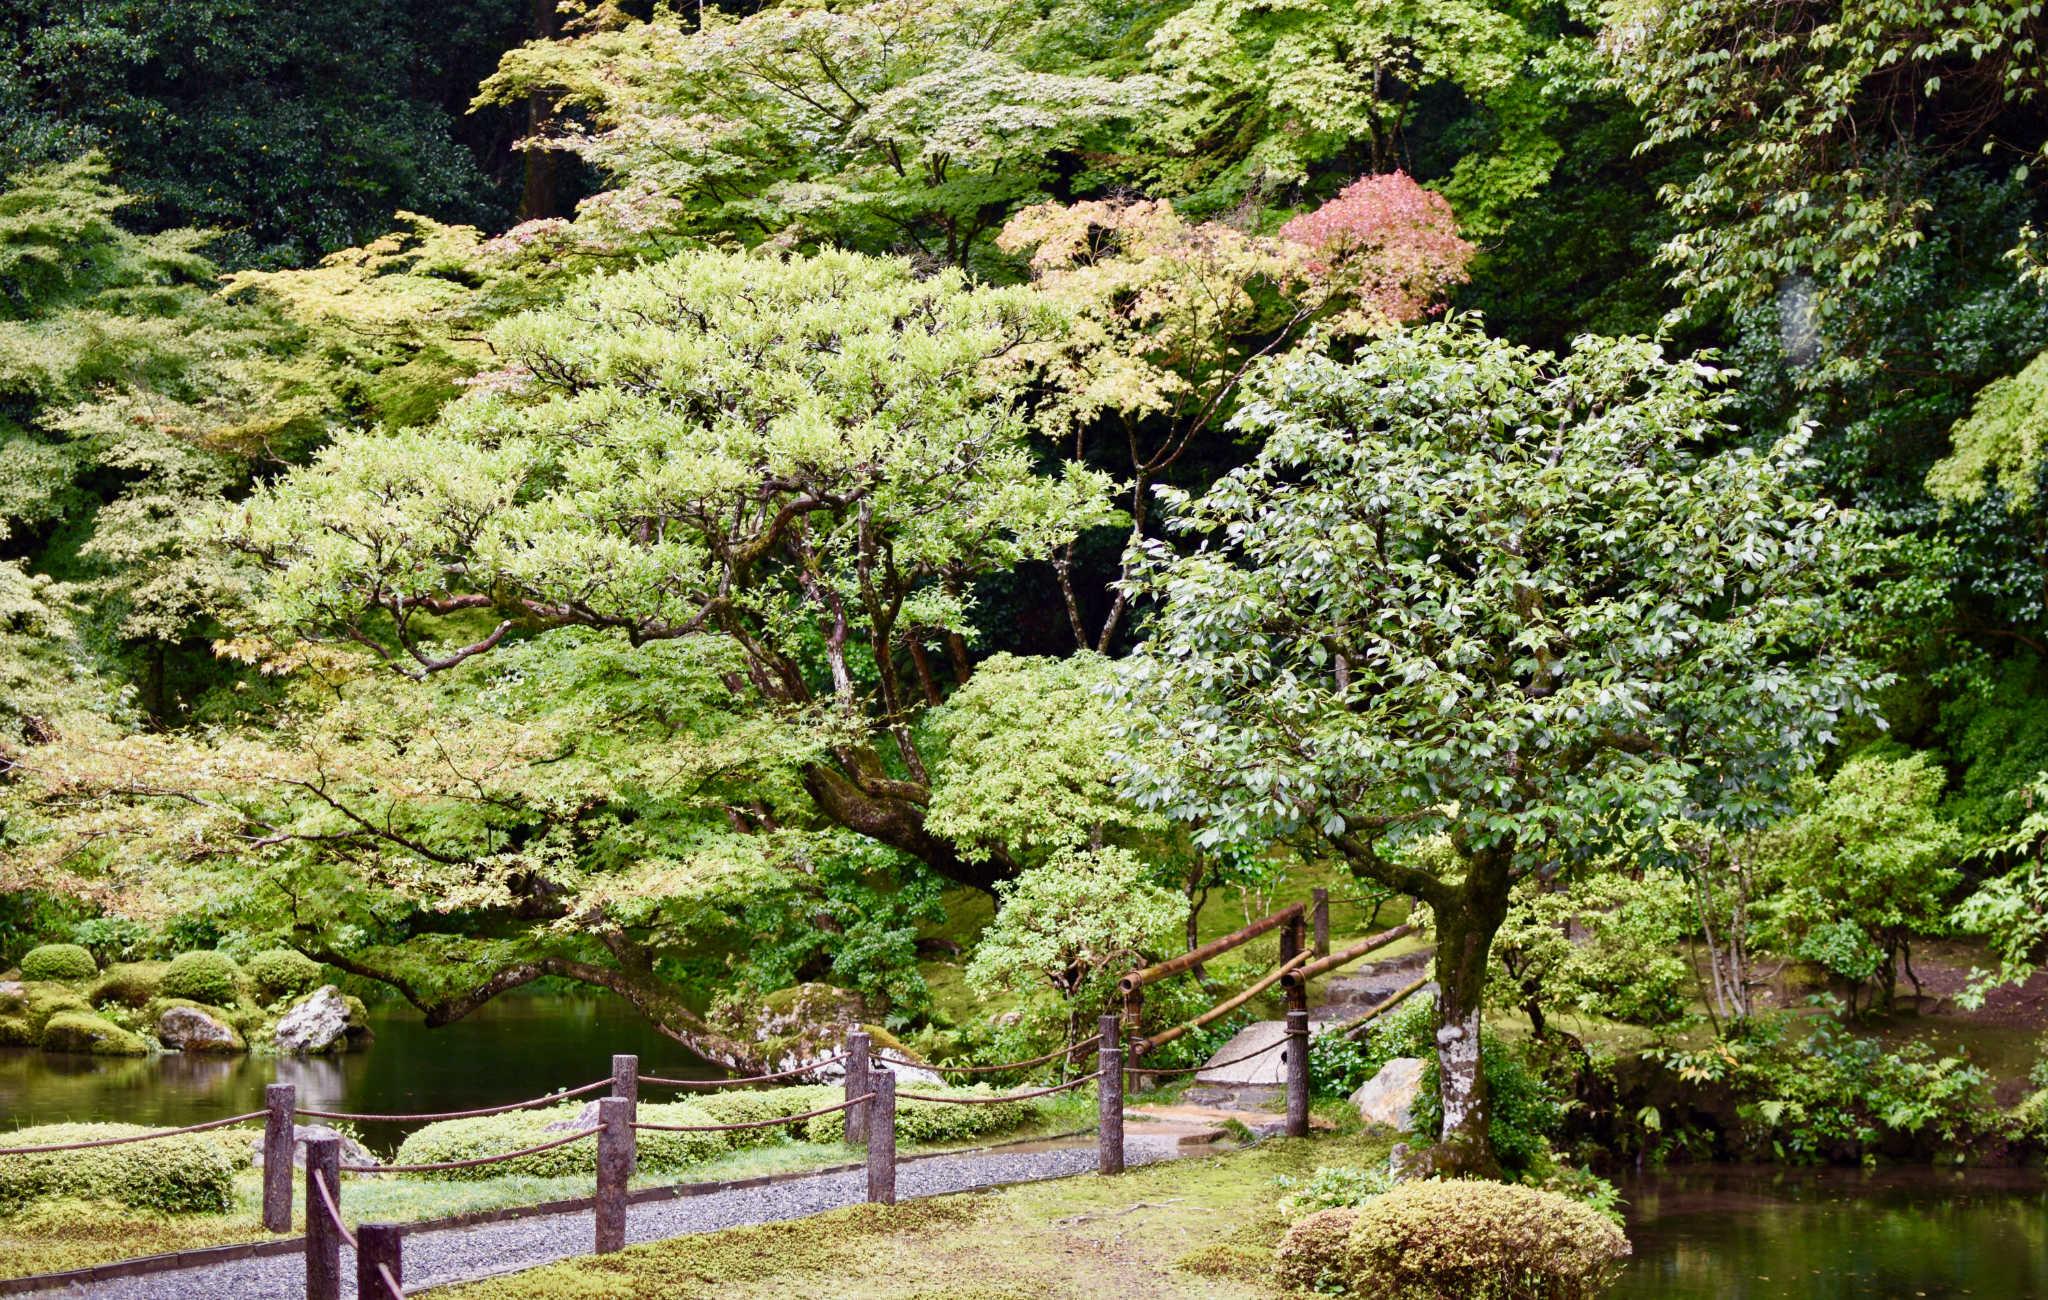 Une promenade rafraichissante aumilieu d'arbres